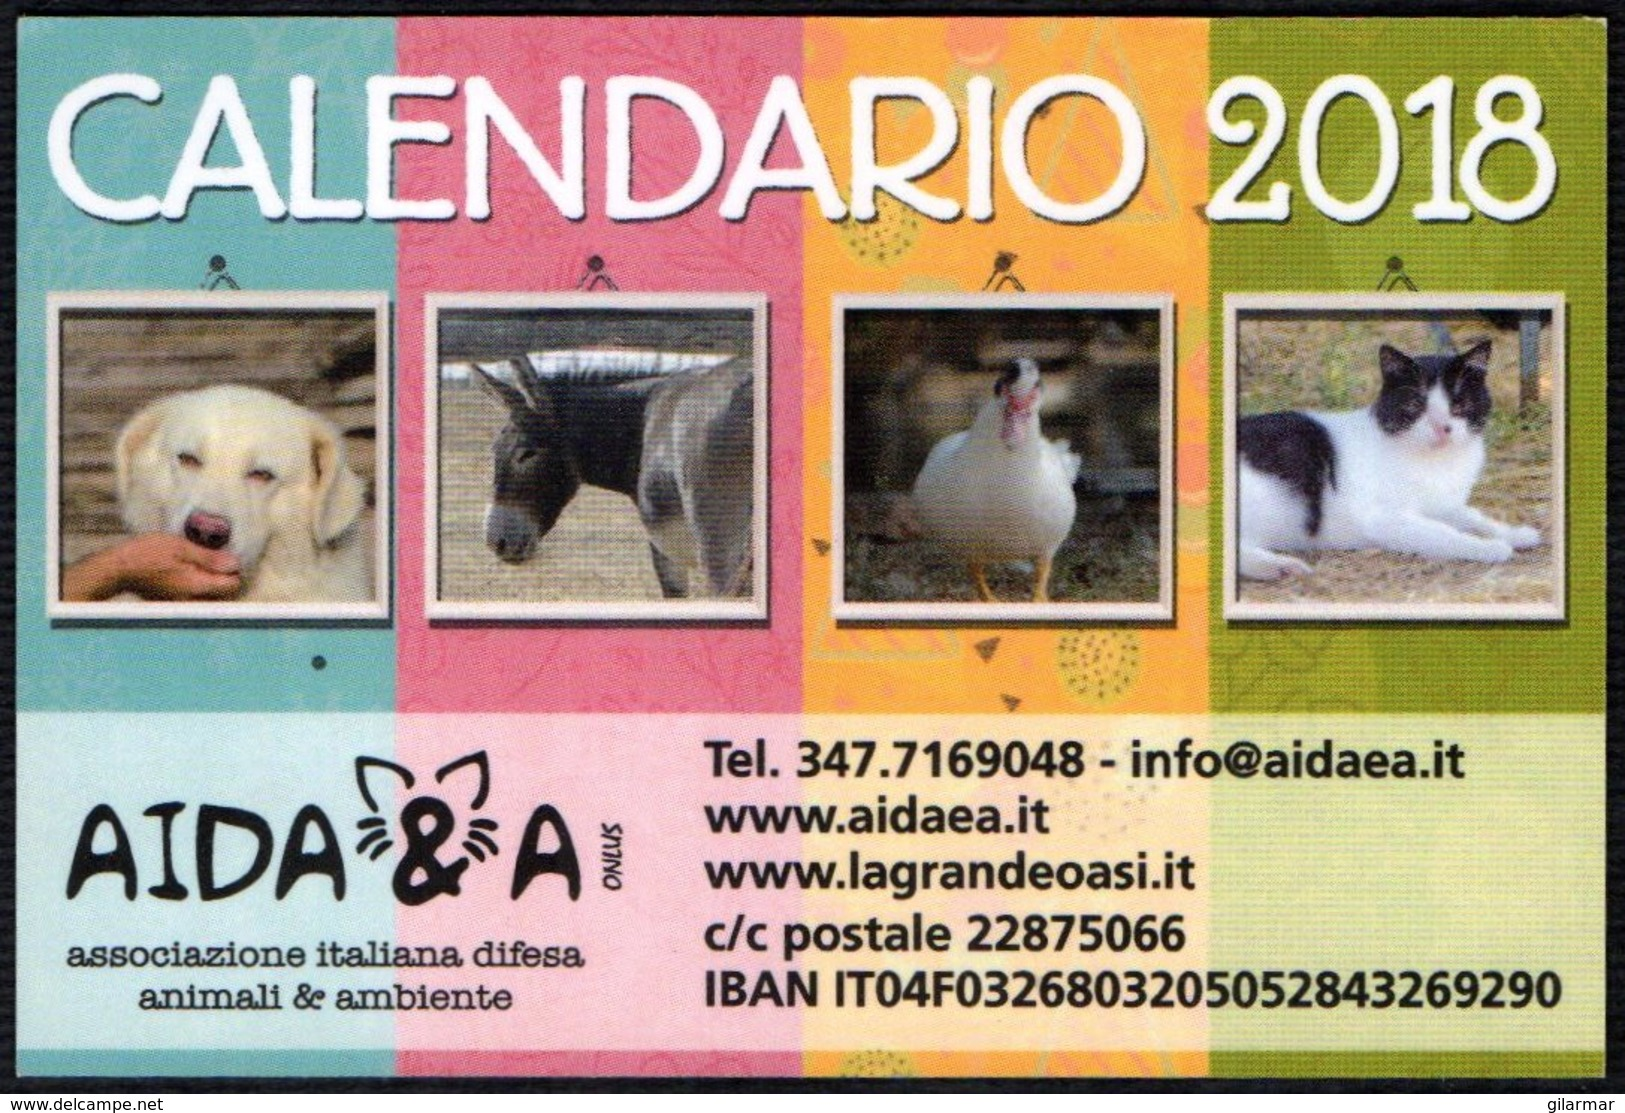 ITALIA 2018 - CALENDARIO TASCABILE - AIDA & A - DOGS / CATS / DONKEY / HEN - Calendari